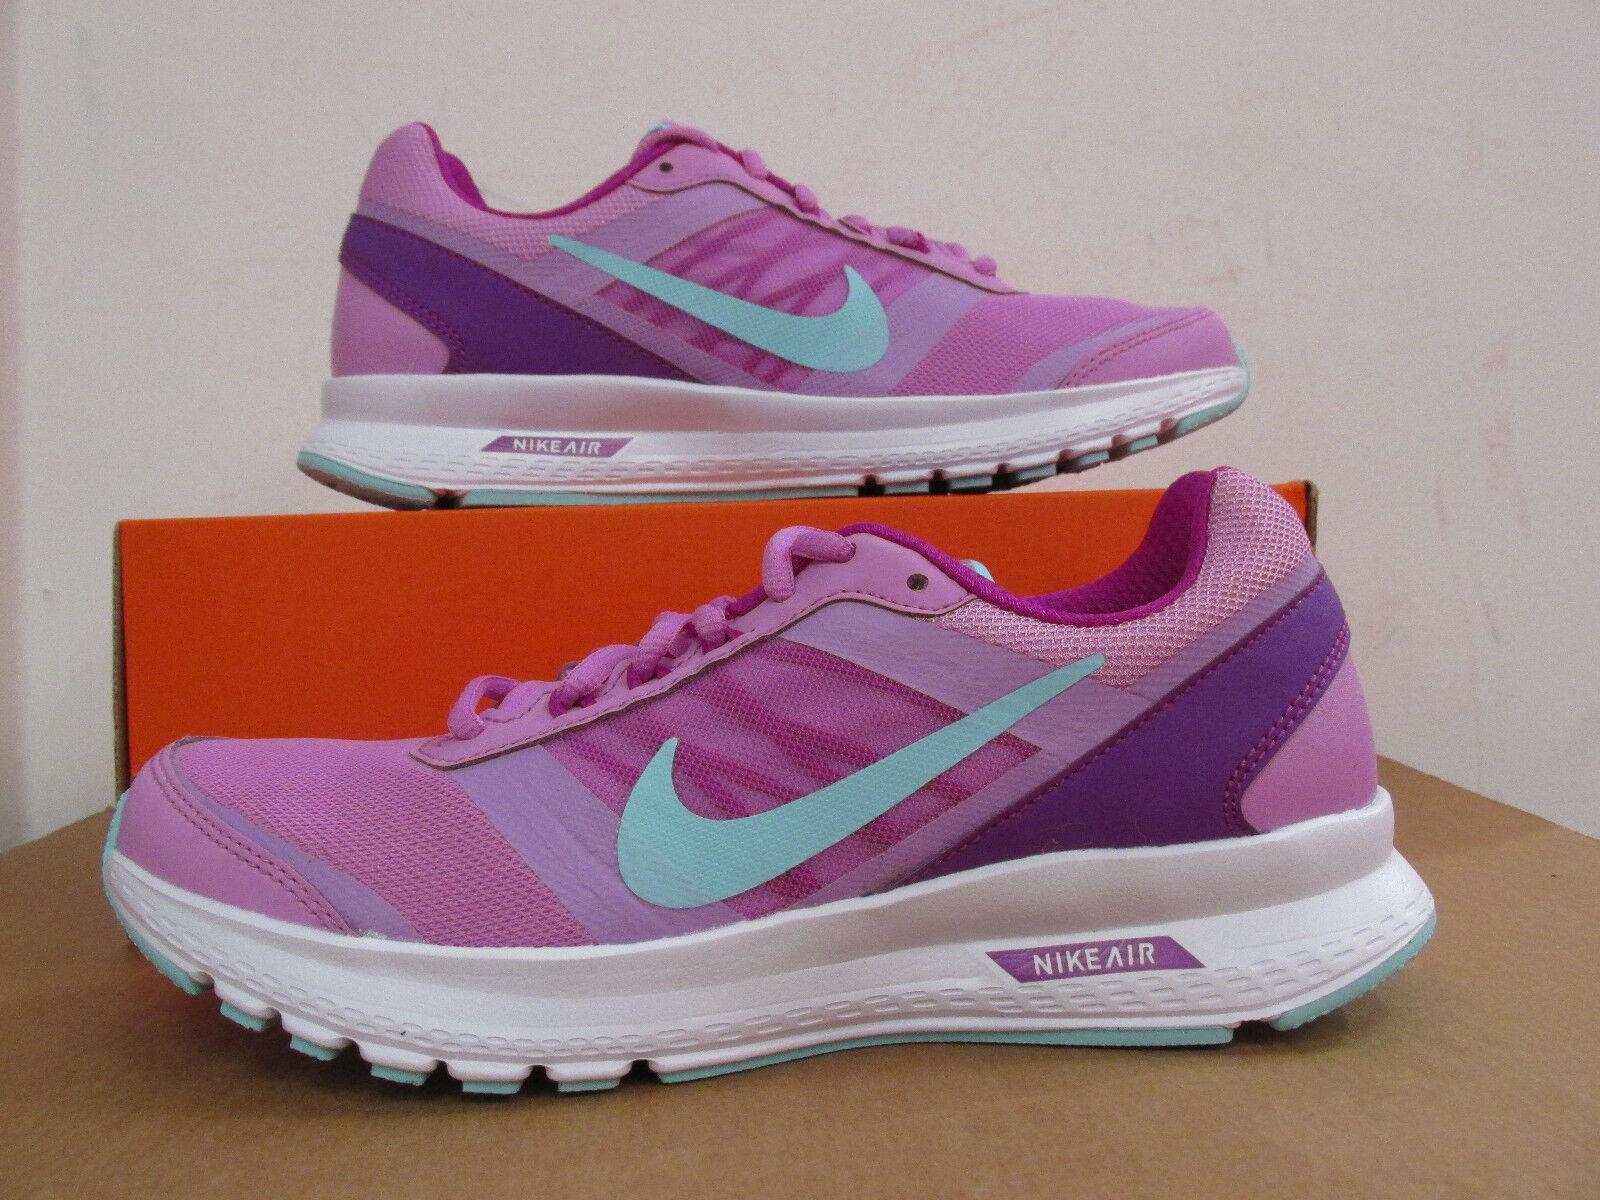 Nike 807099 Luft Relentless 5 Msl Damen 807099 Nike 500 Sneakers Schuhe Ausverkauf 2f60d2